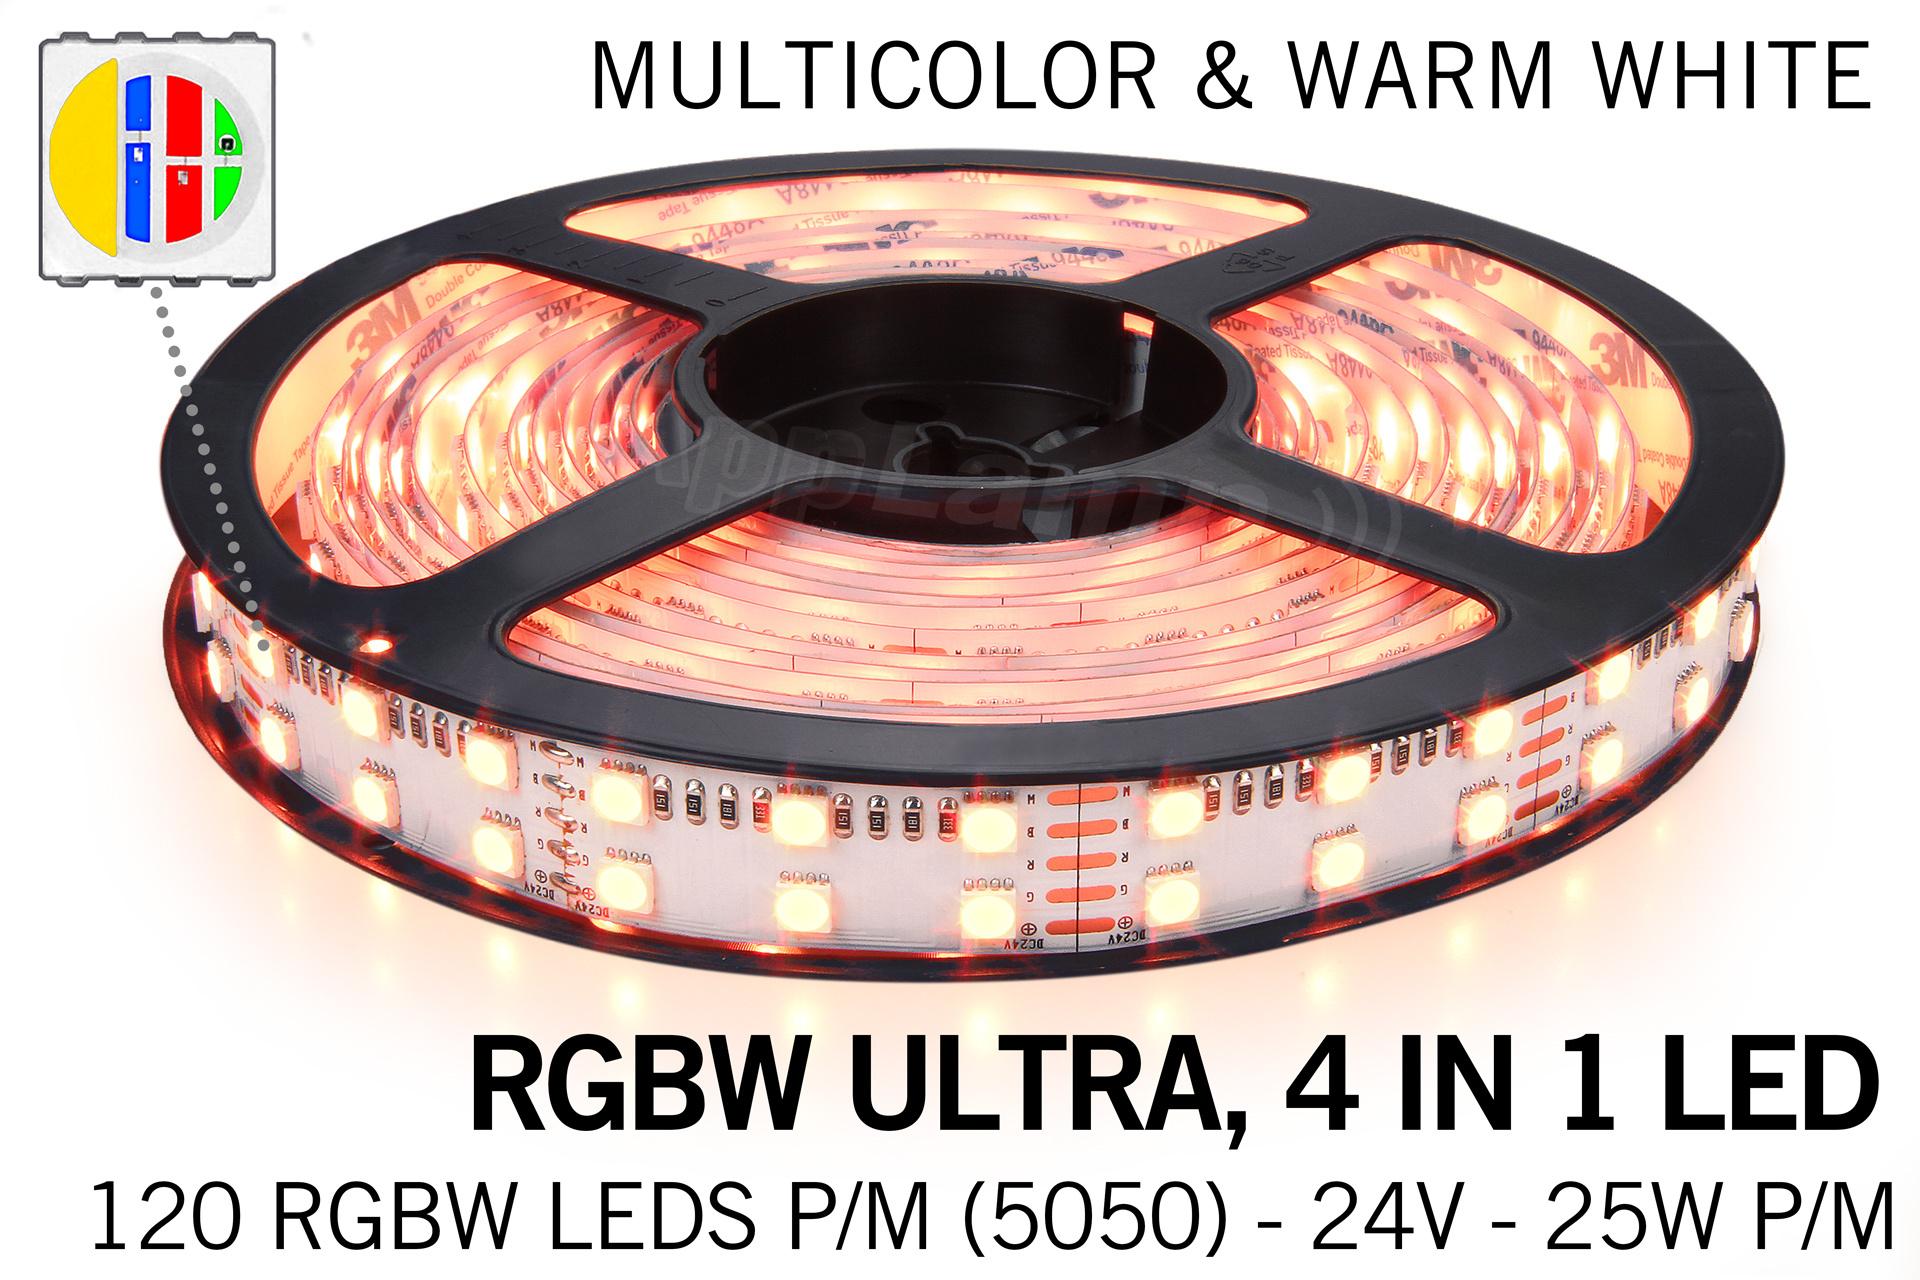 RGB & Warm Wit Ultra 4 in 1 Led Strip | Dubbele rij 120 Leds pm Losse Strip